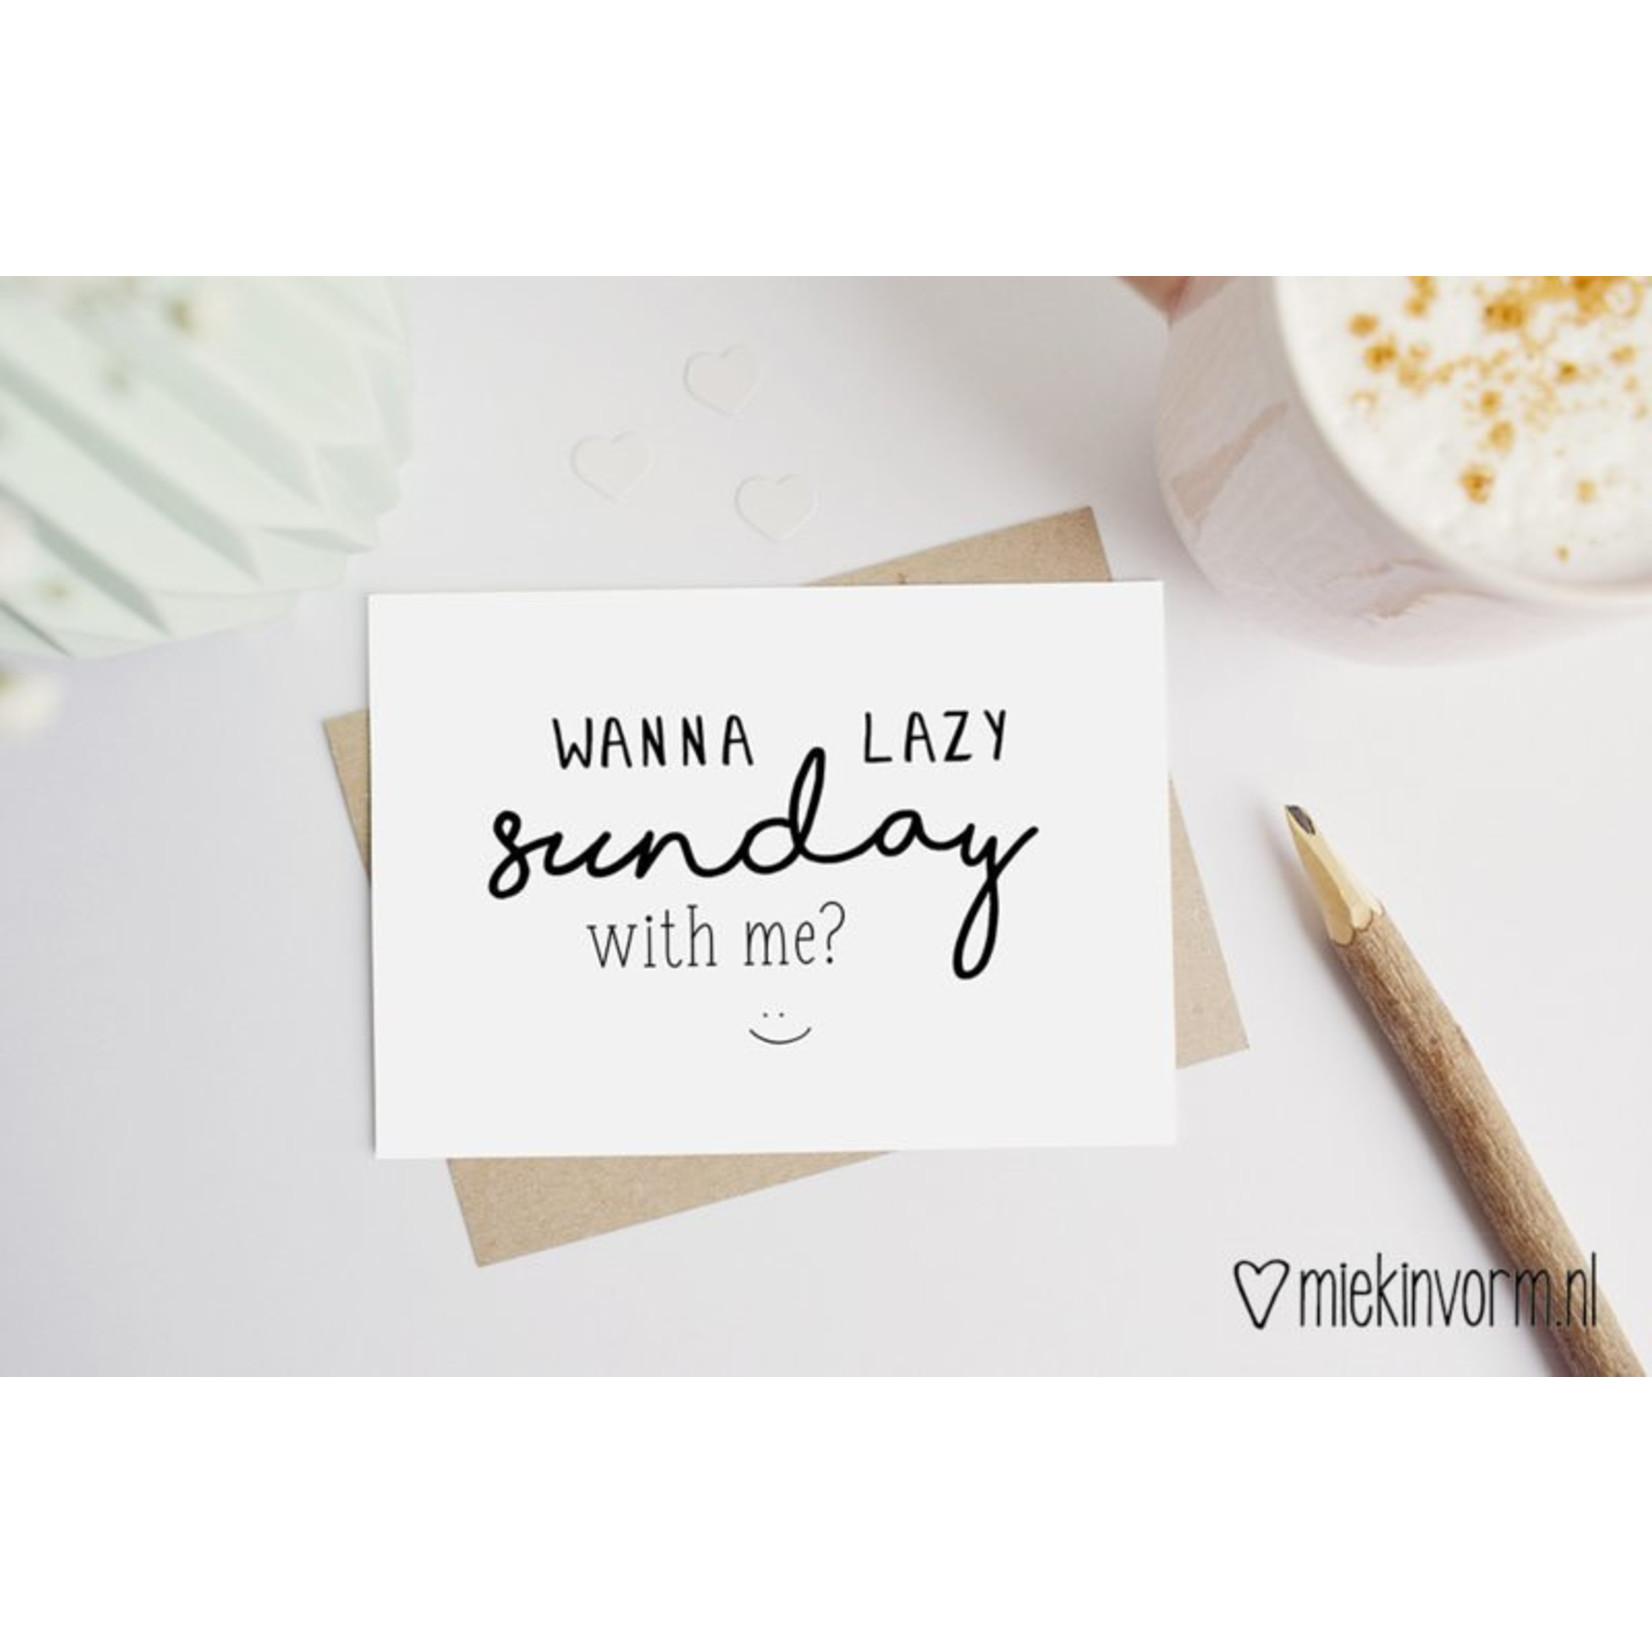 MIEKinvorm Ansichtkaart Wanna lazy sunday with me?